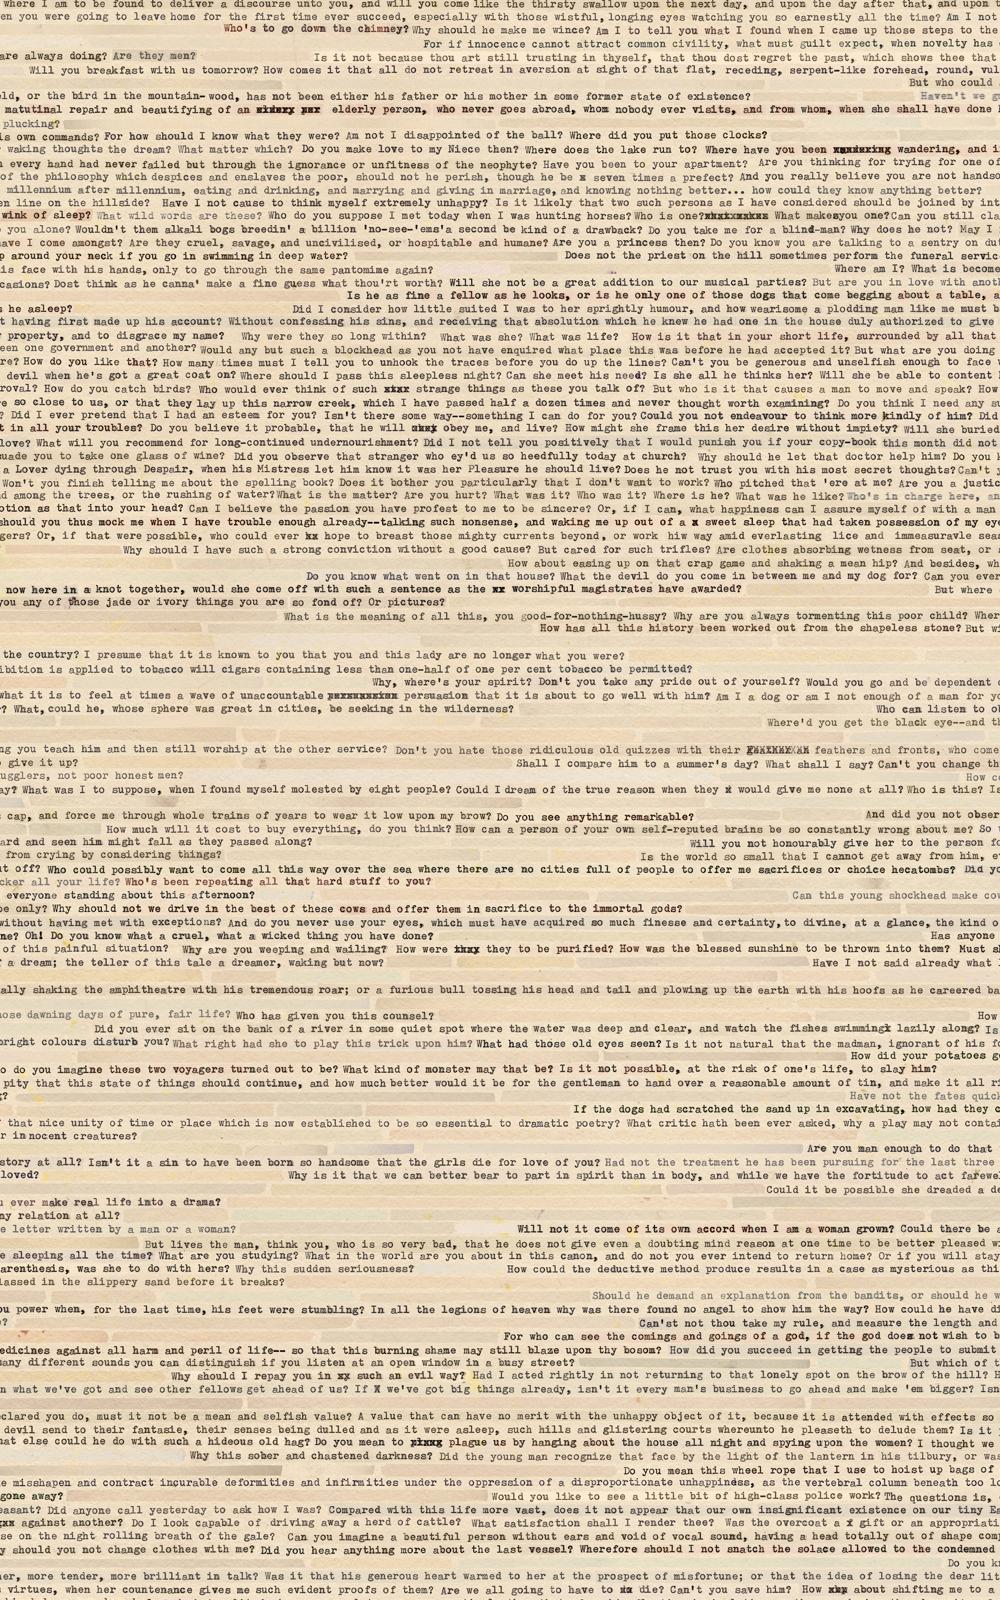 Case Simmons, Simmons & Burke, Score Collage Poem #2, SMMoA, Santa Monica Museum of Art,Digital Collage,Digital Art, Case Simmons Art, Text Art, Font Art, Typewriter Art, Photoshop Collage, Livrivox, Fiction Art, Internet Archive